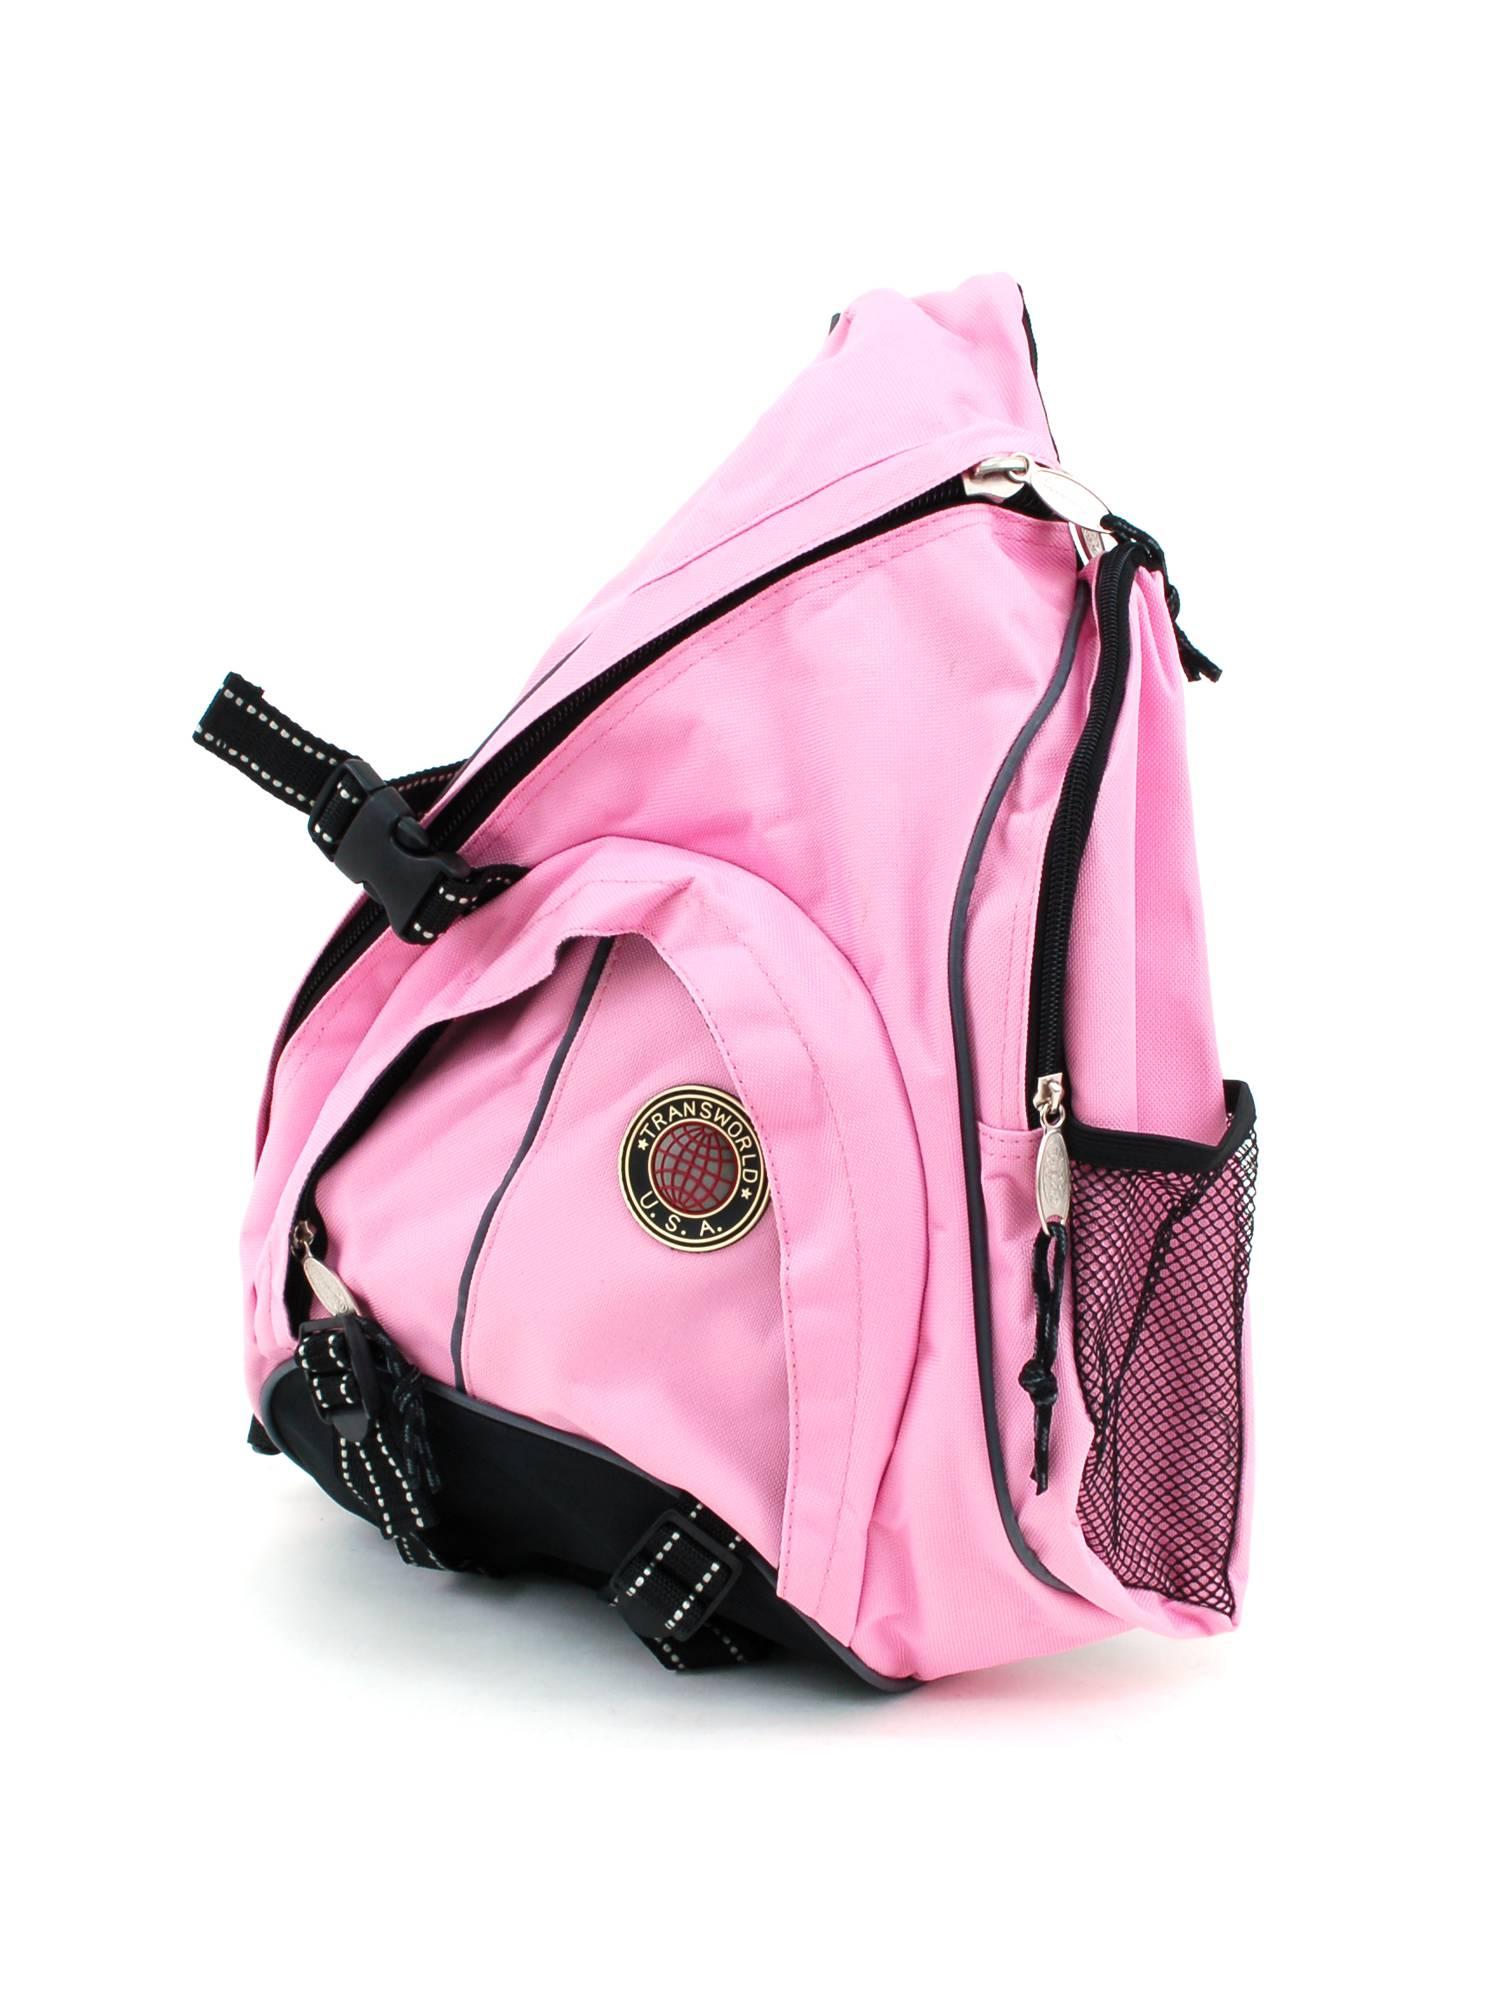 Backpack Messenger Bag Cross Body Organizer Single Strap Sling Shoulder Carryall by Transworld